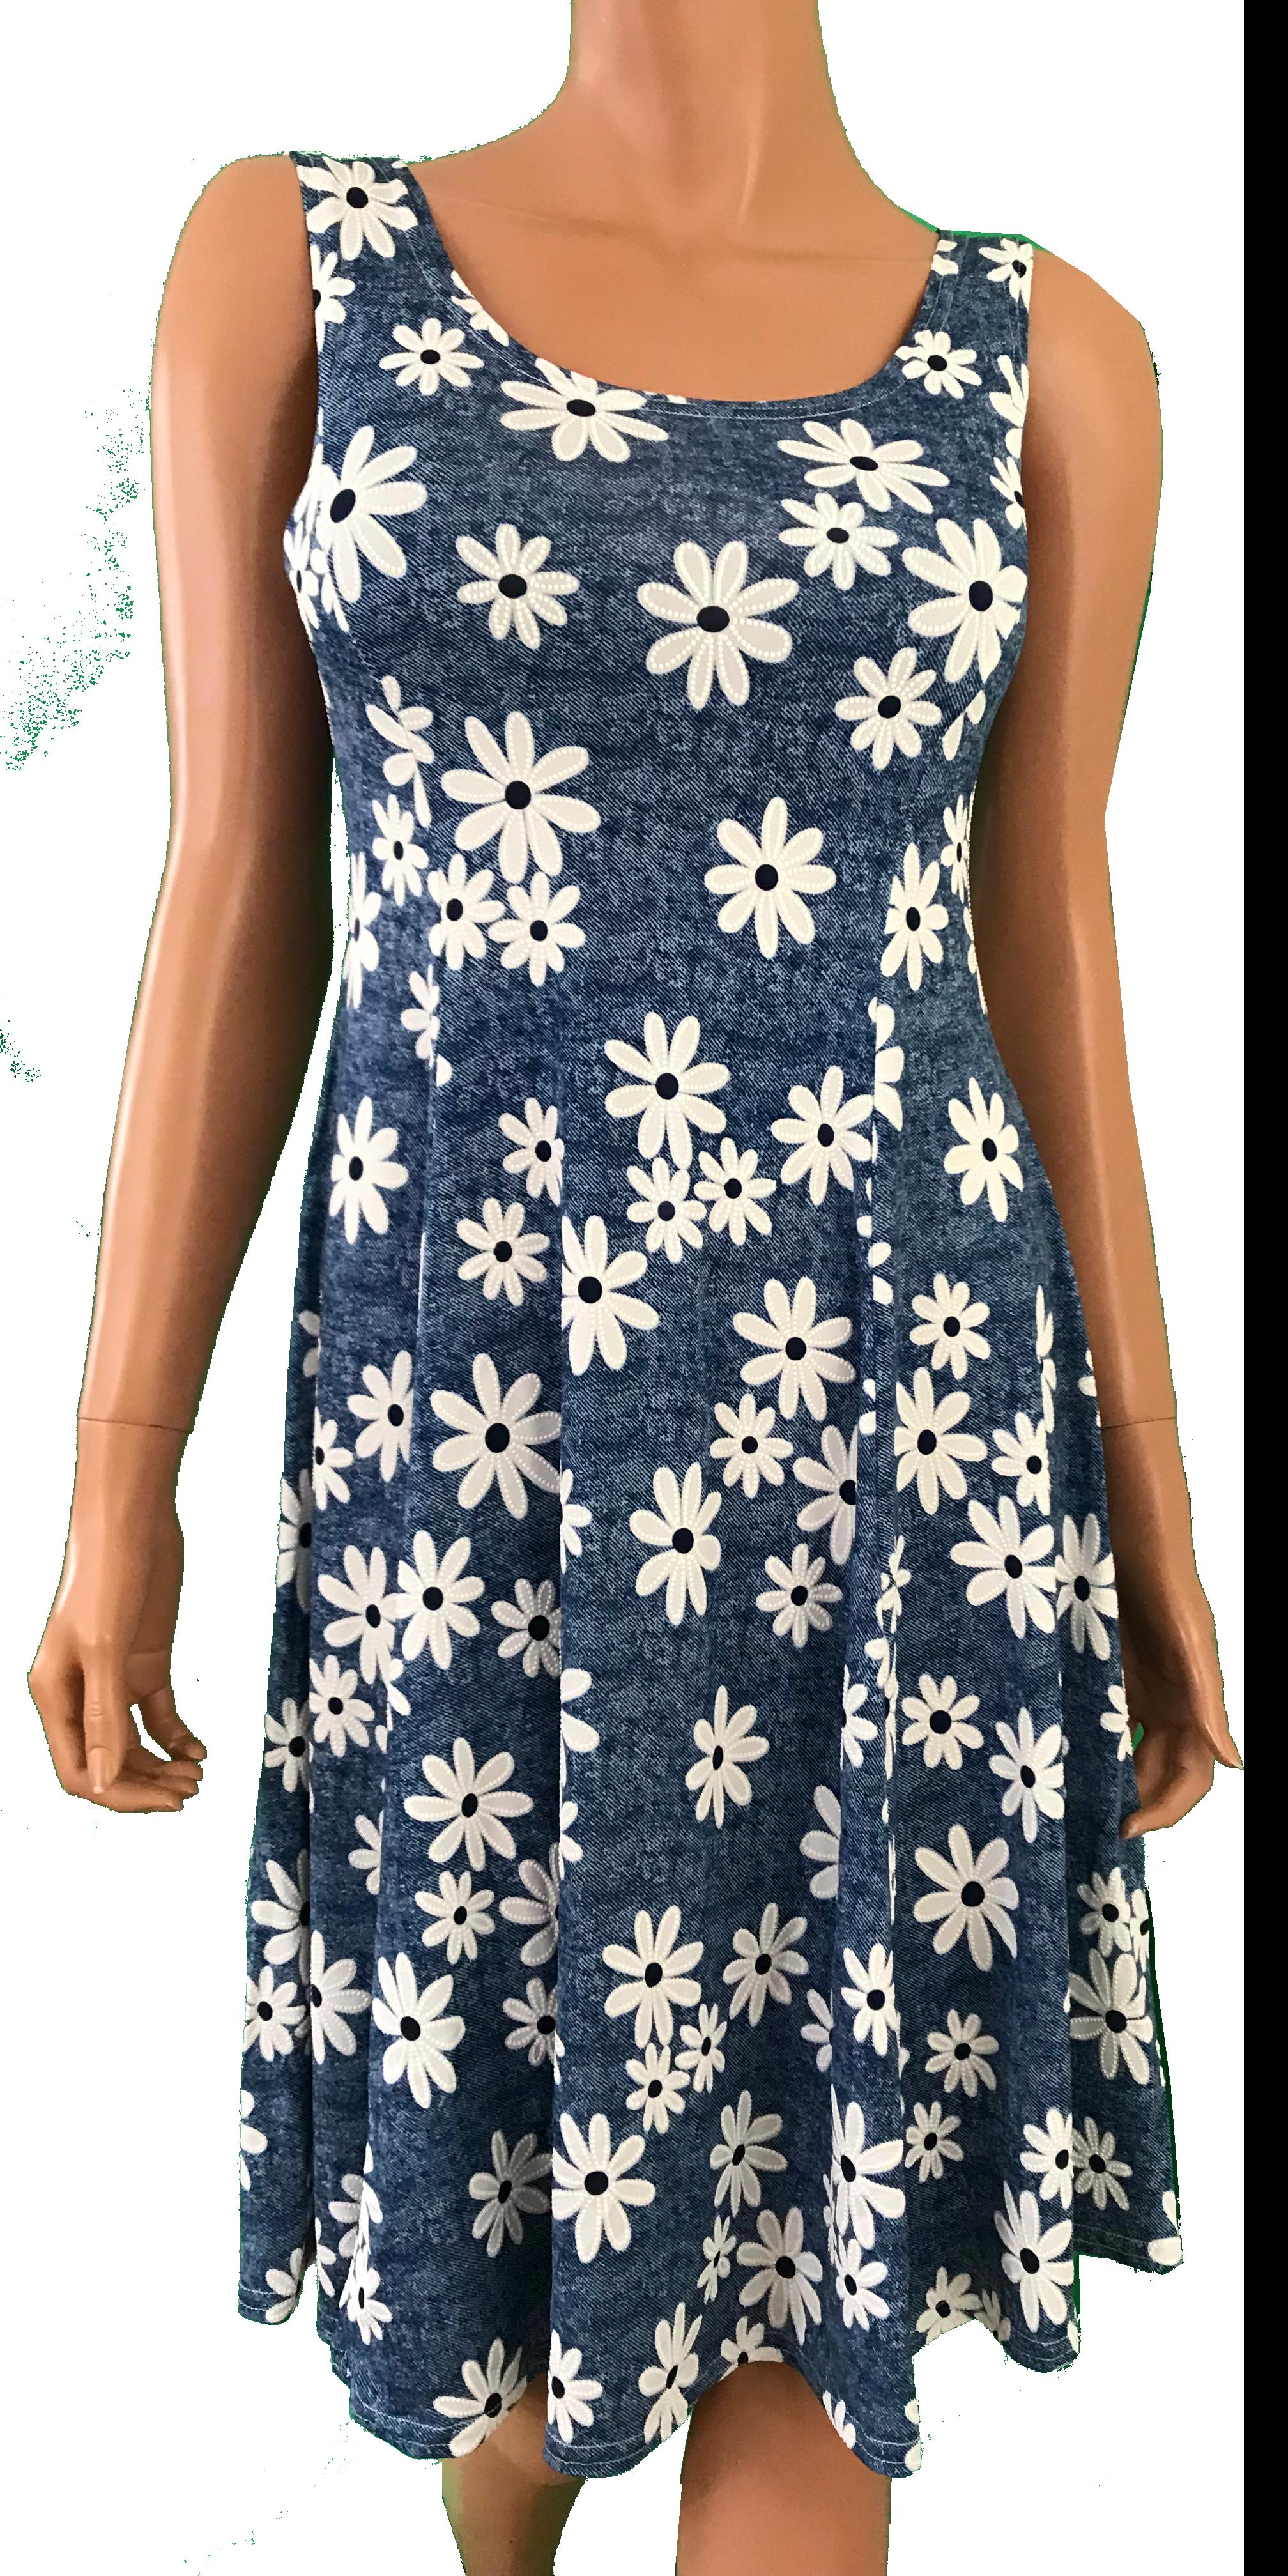 ee8c29f4 Prinsessesnit u. ærmer - Blå blomst - ALLE VORES KJOLER - Mamelukken